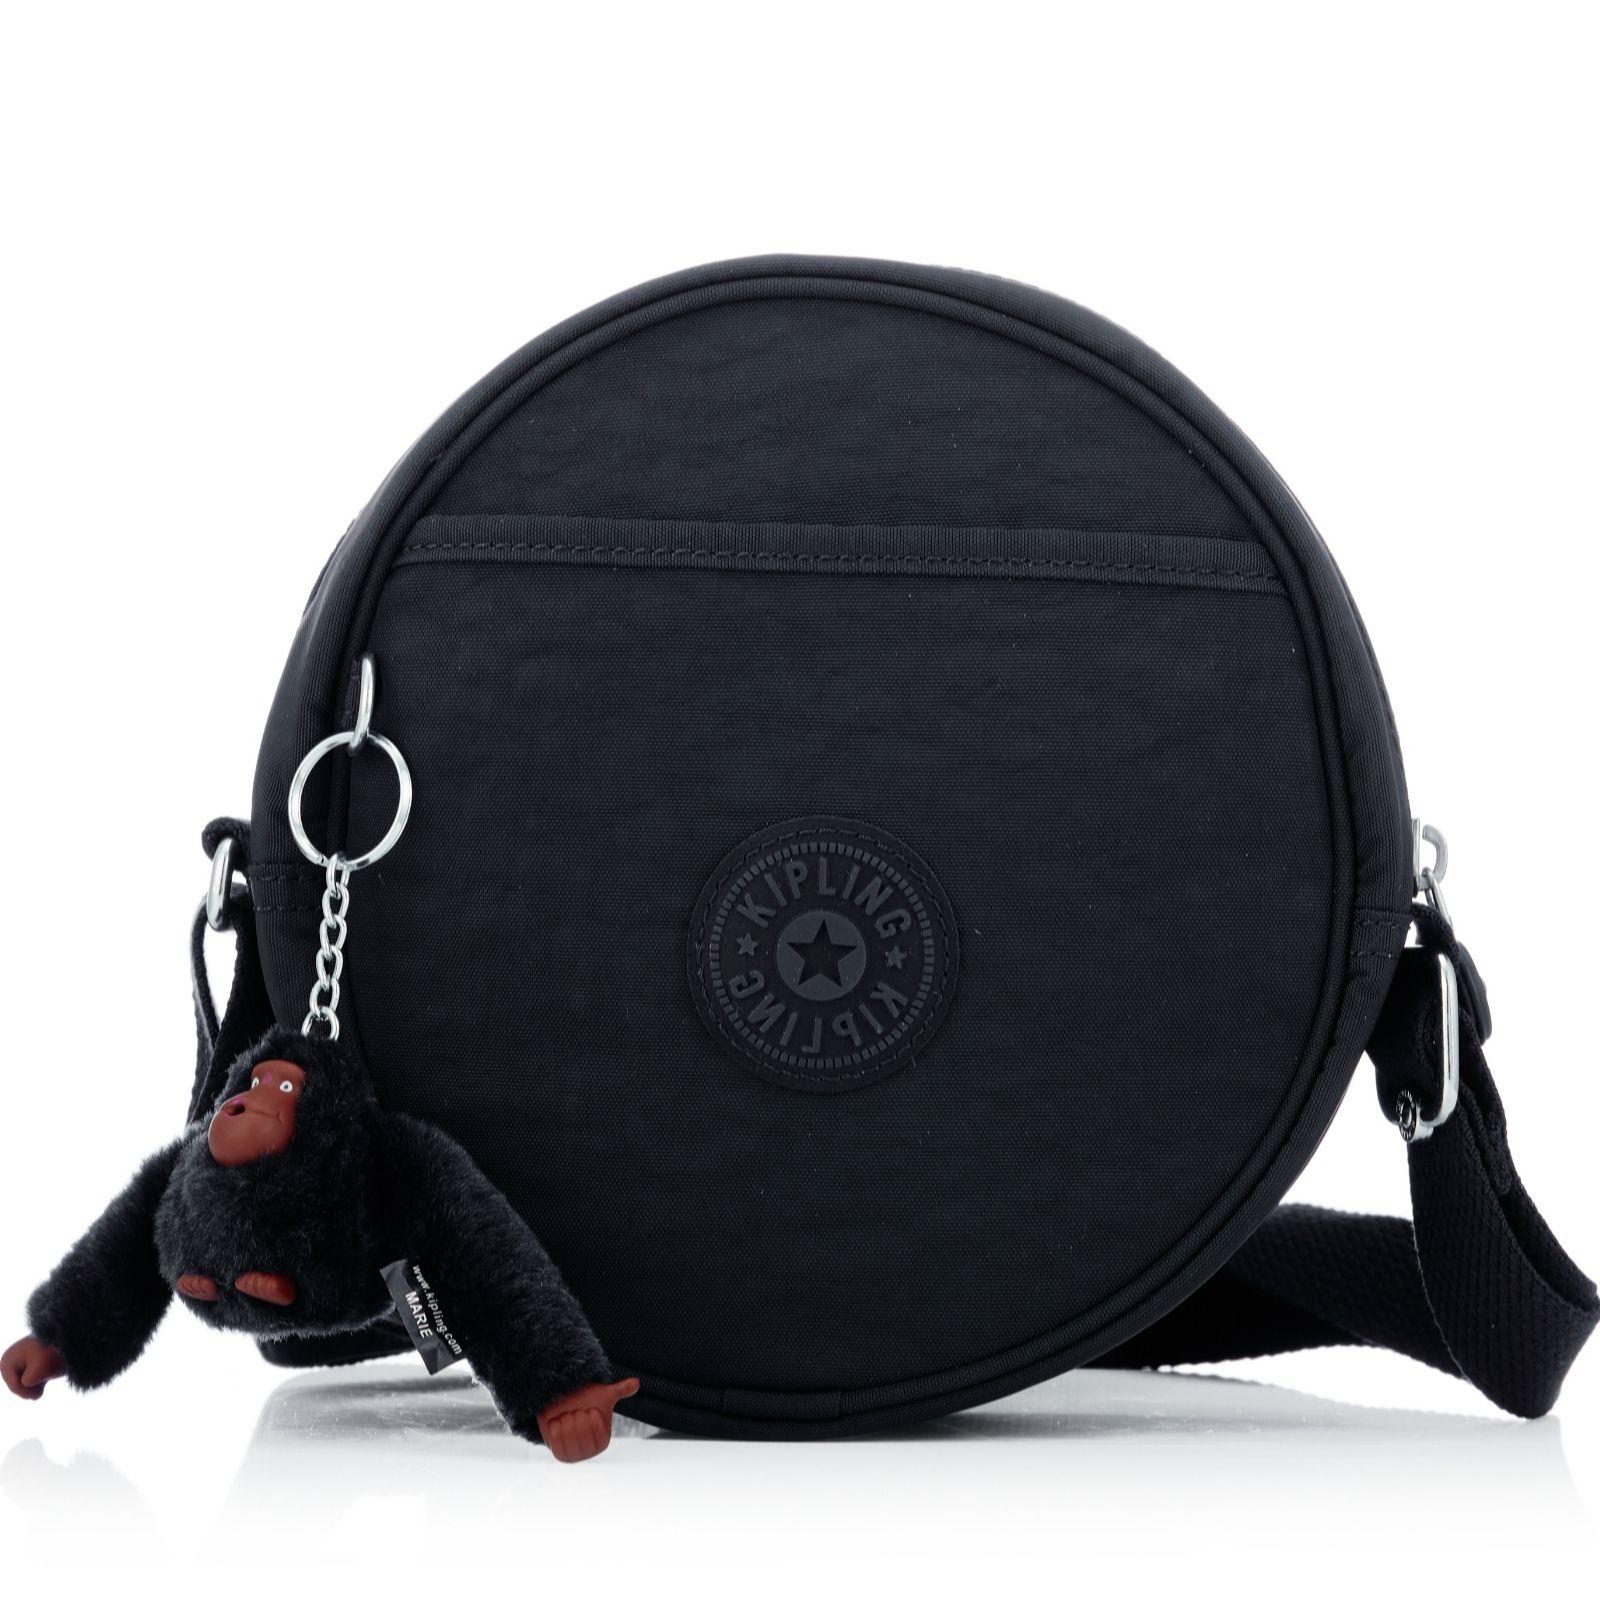 71093aaab7 Kipling Avaros Crossbody Bag - QVC UK